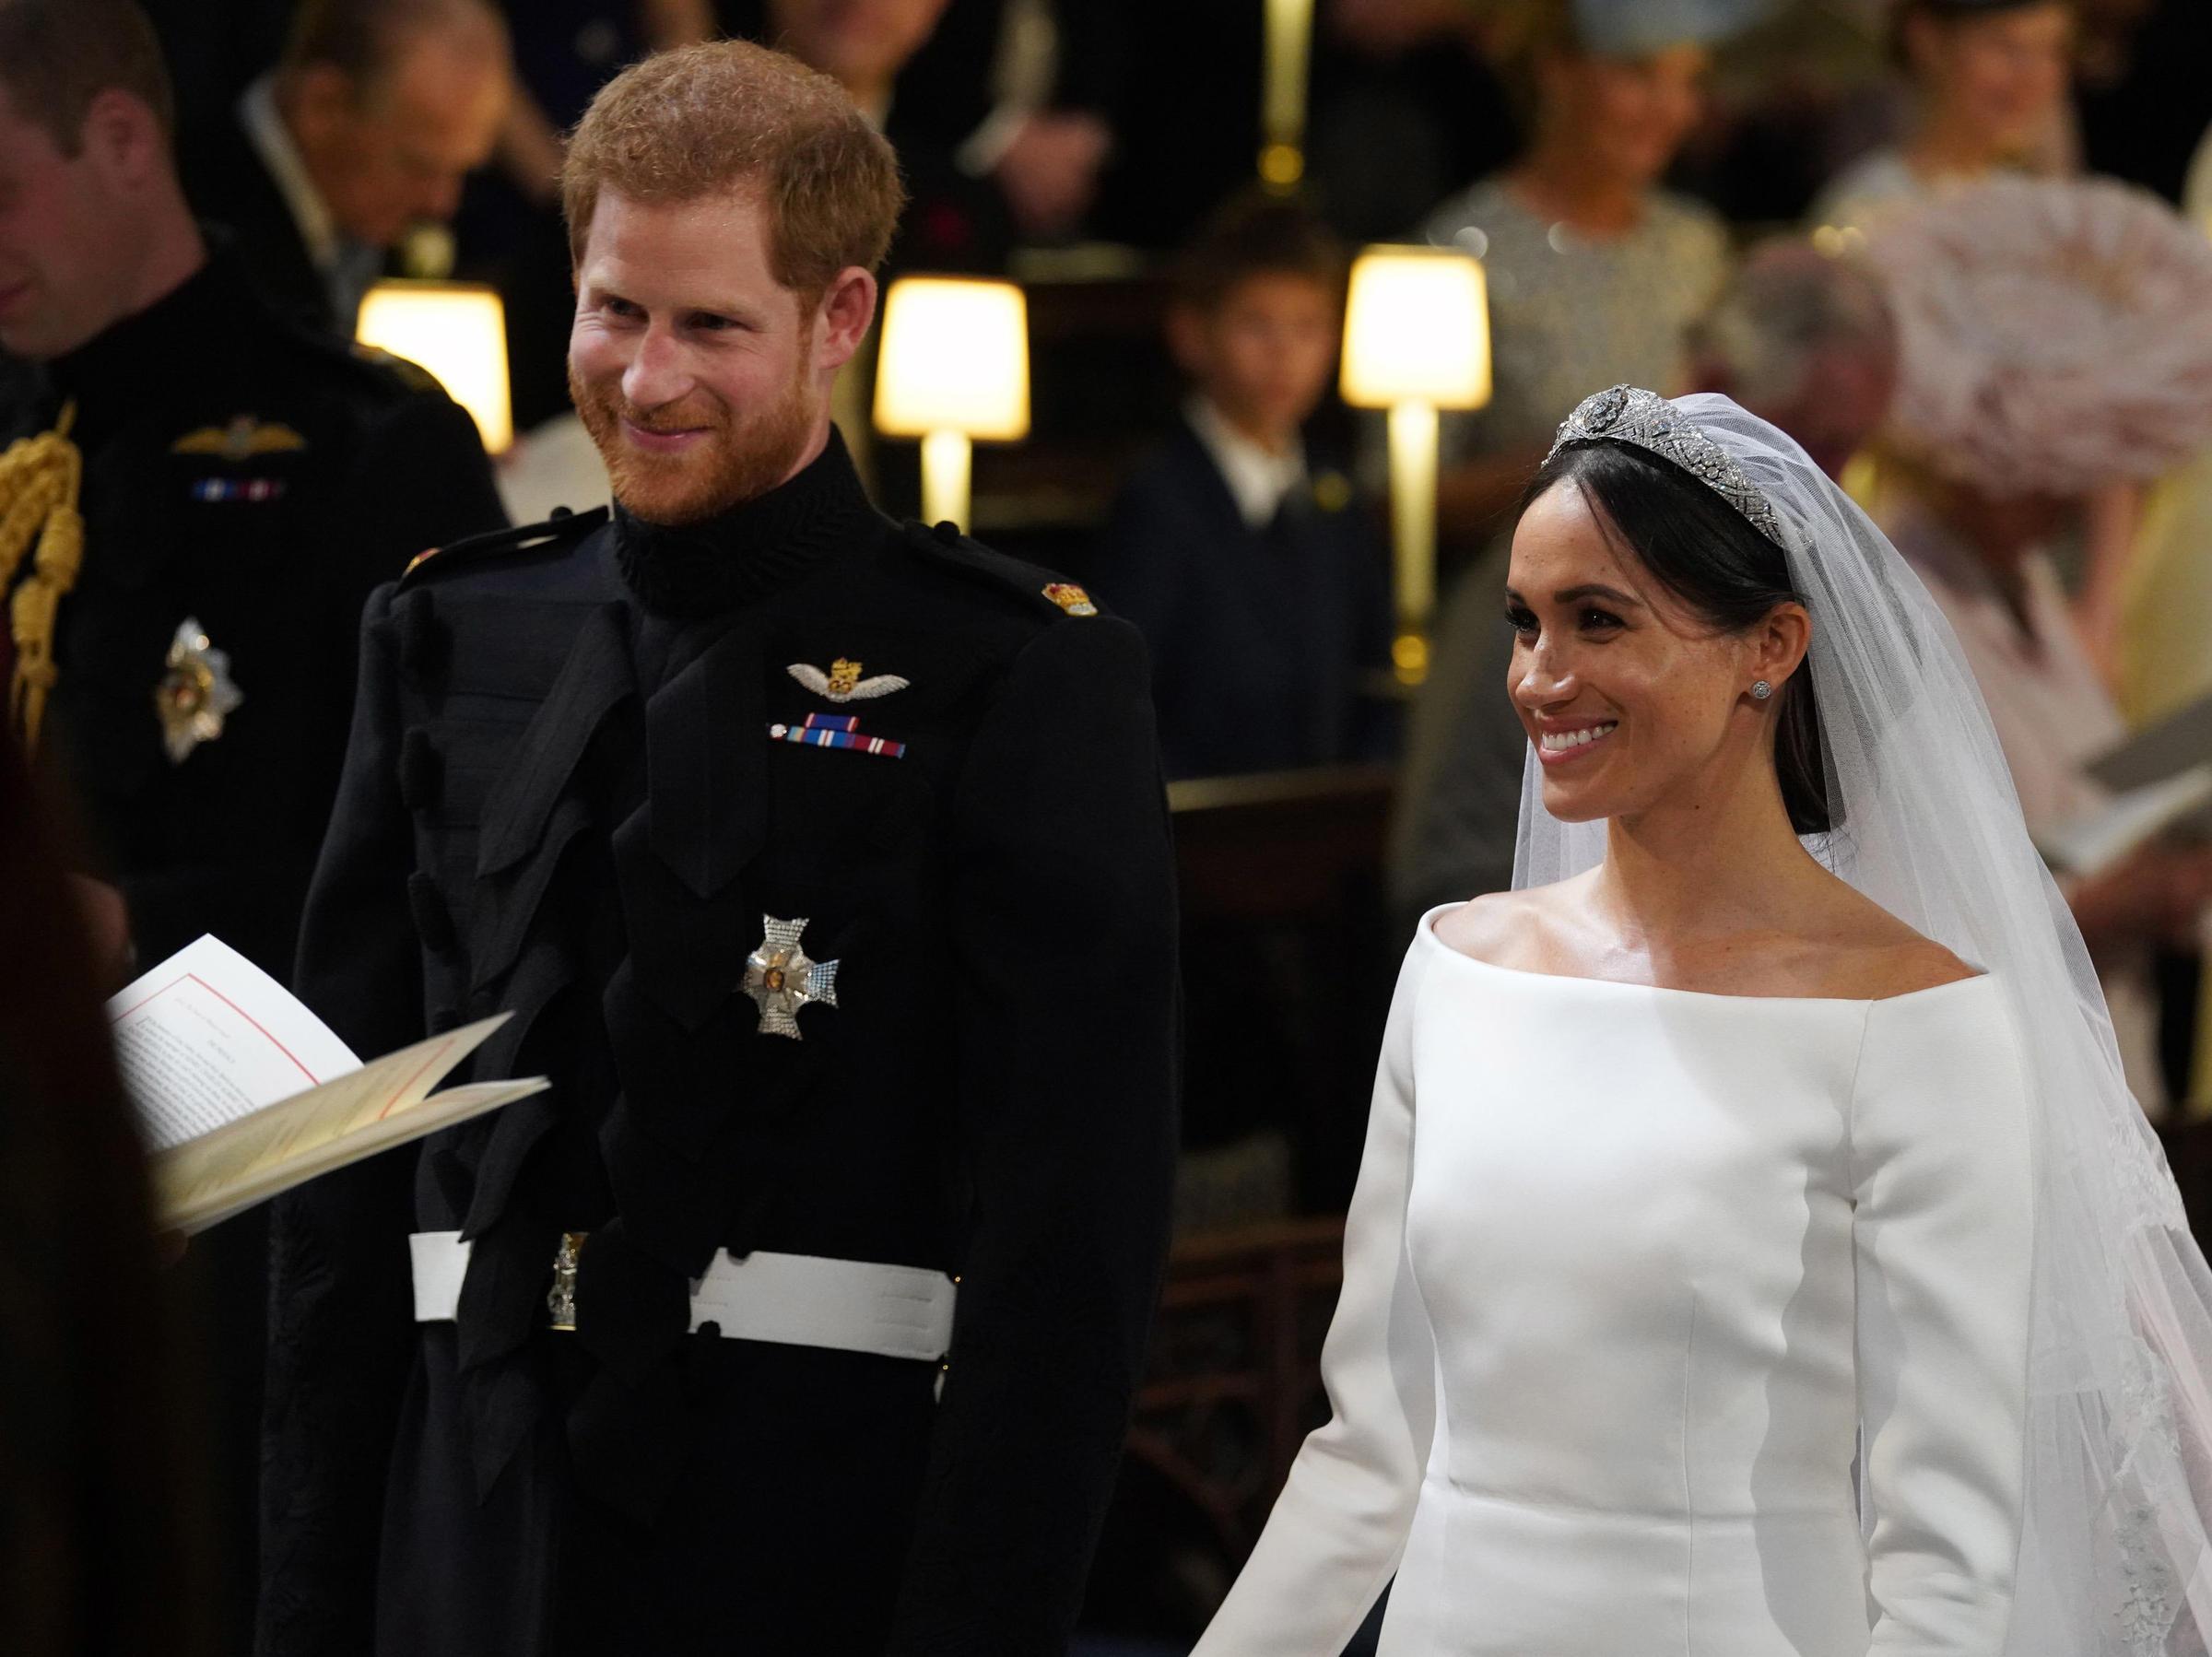 Prince Harry Wedding.Watch The Royal Wedding Of Prince Harry And Meghan Markle Kera News